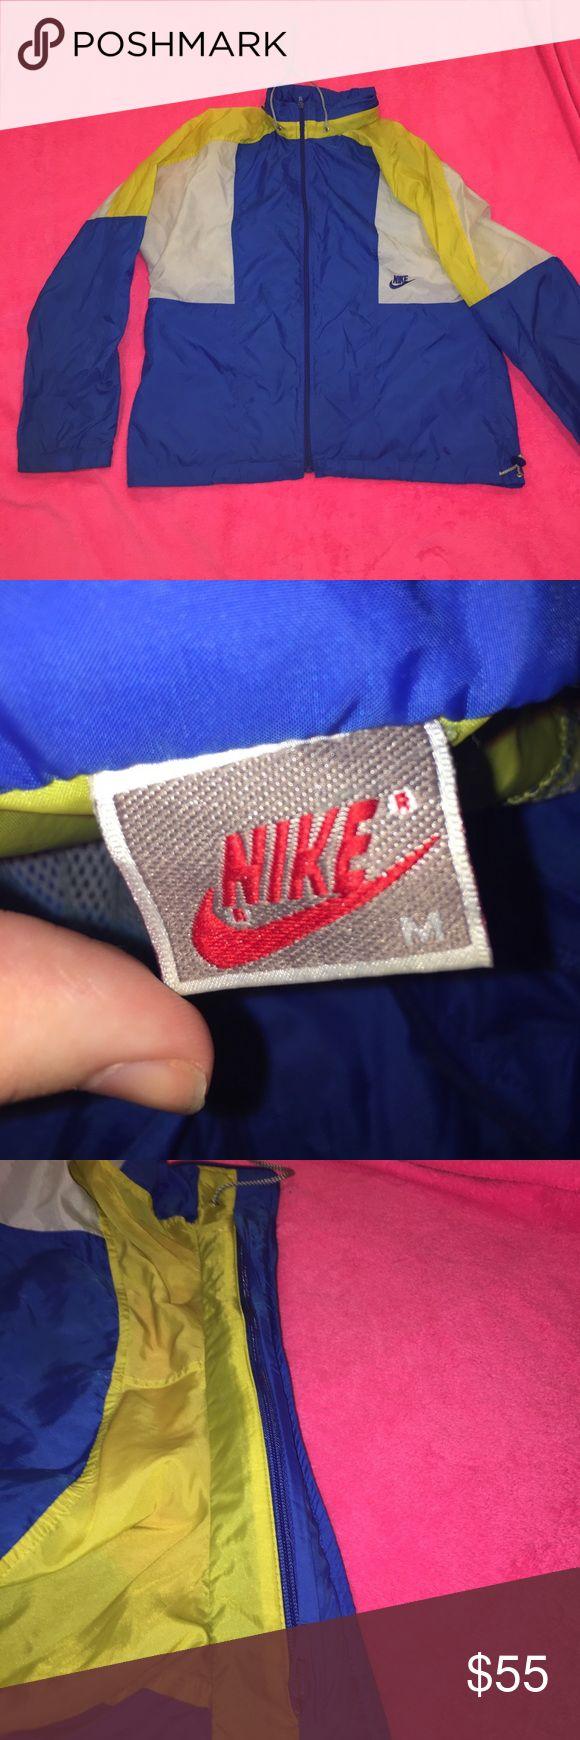 Nike windbreaker never worn cozy windbreaker men s medium but very roomy comes